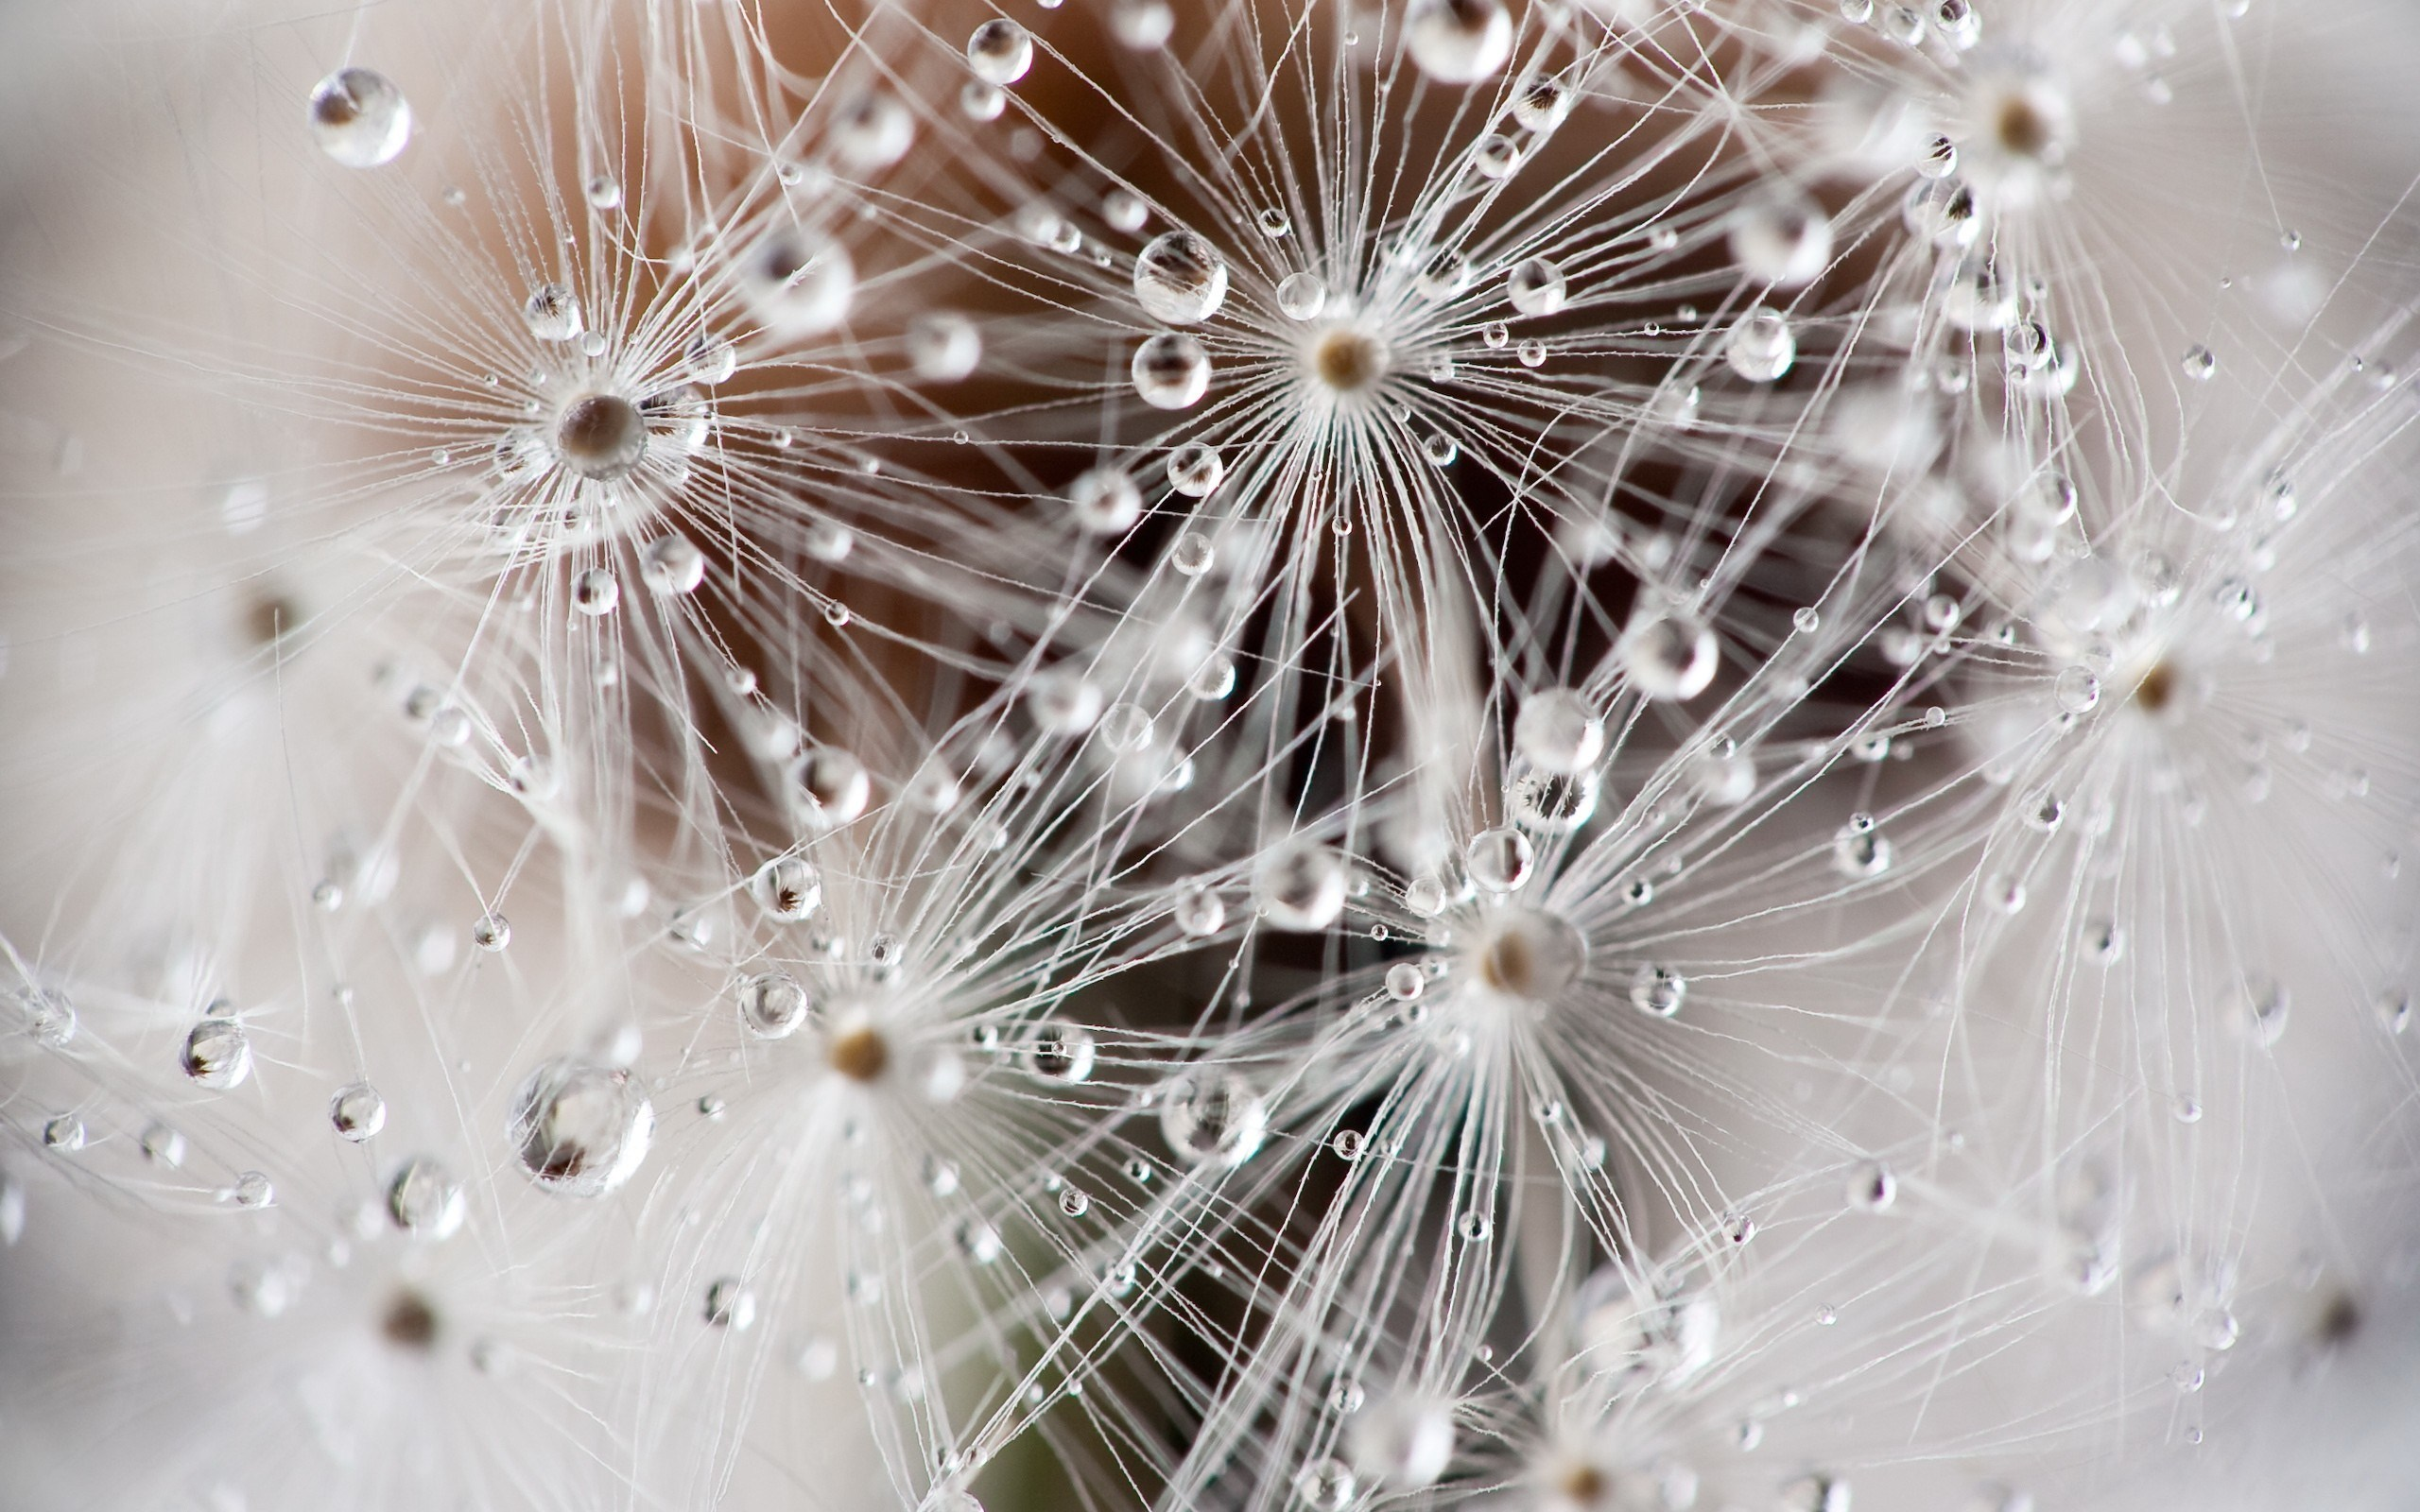 cool dandelion seeds wallpaper 42643